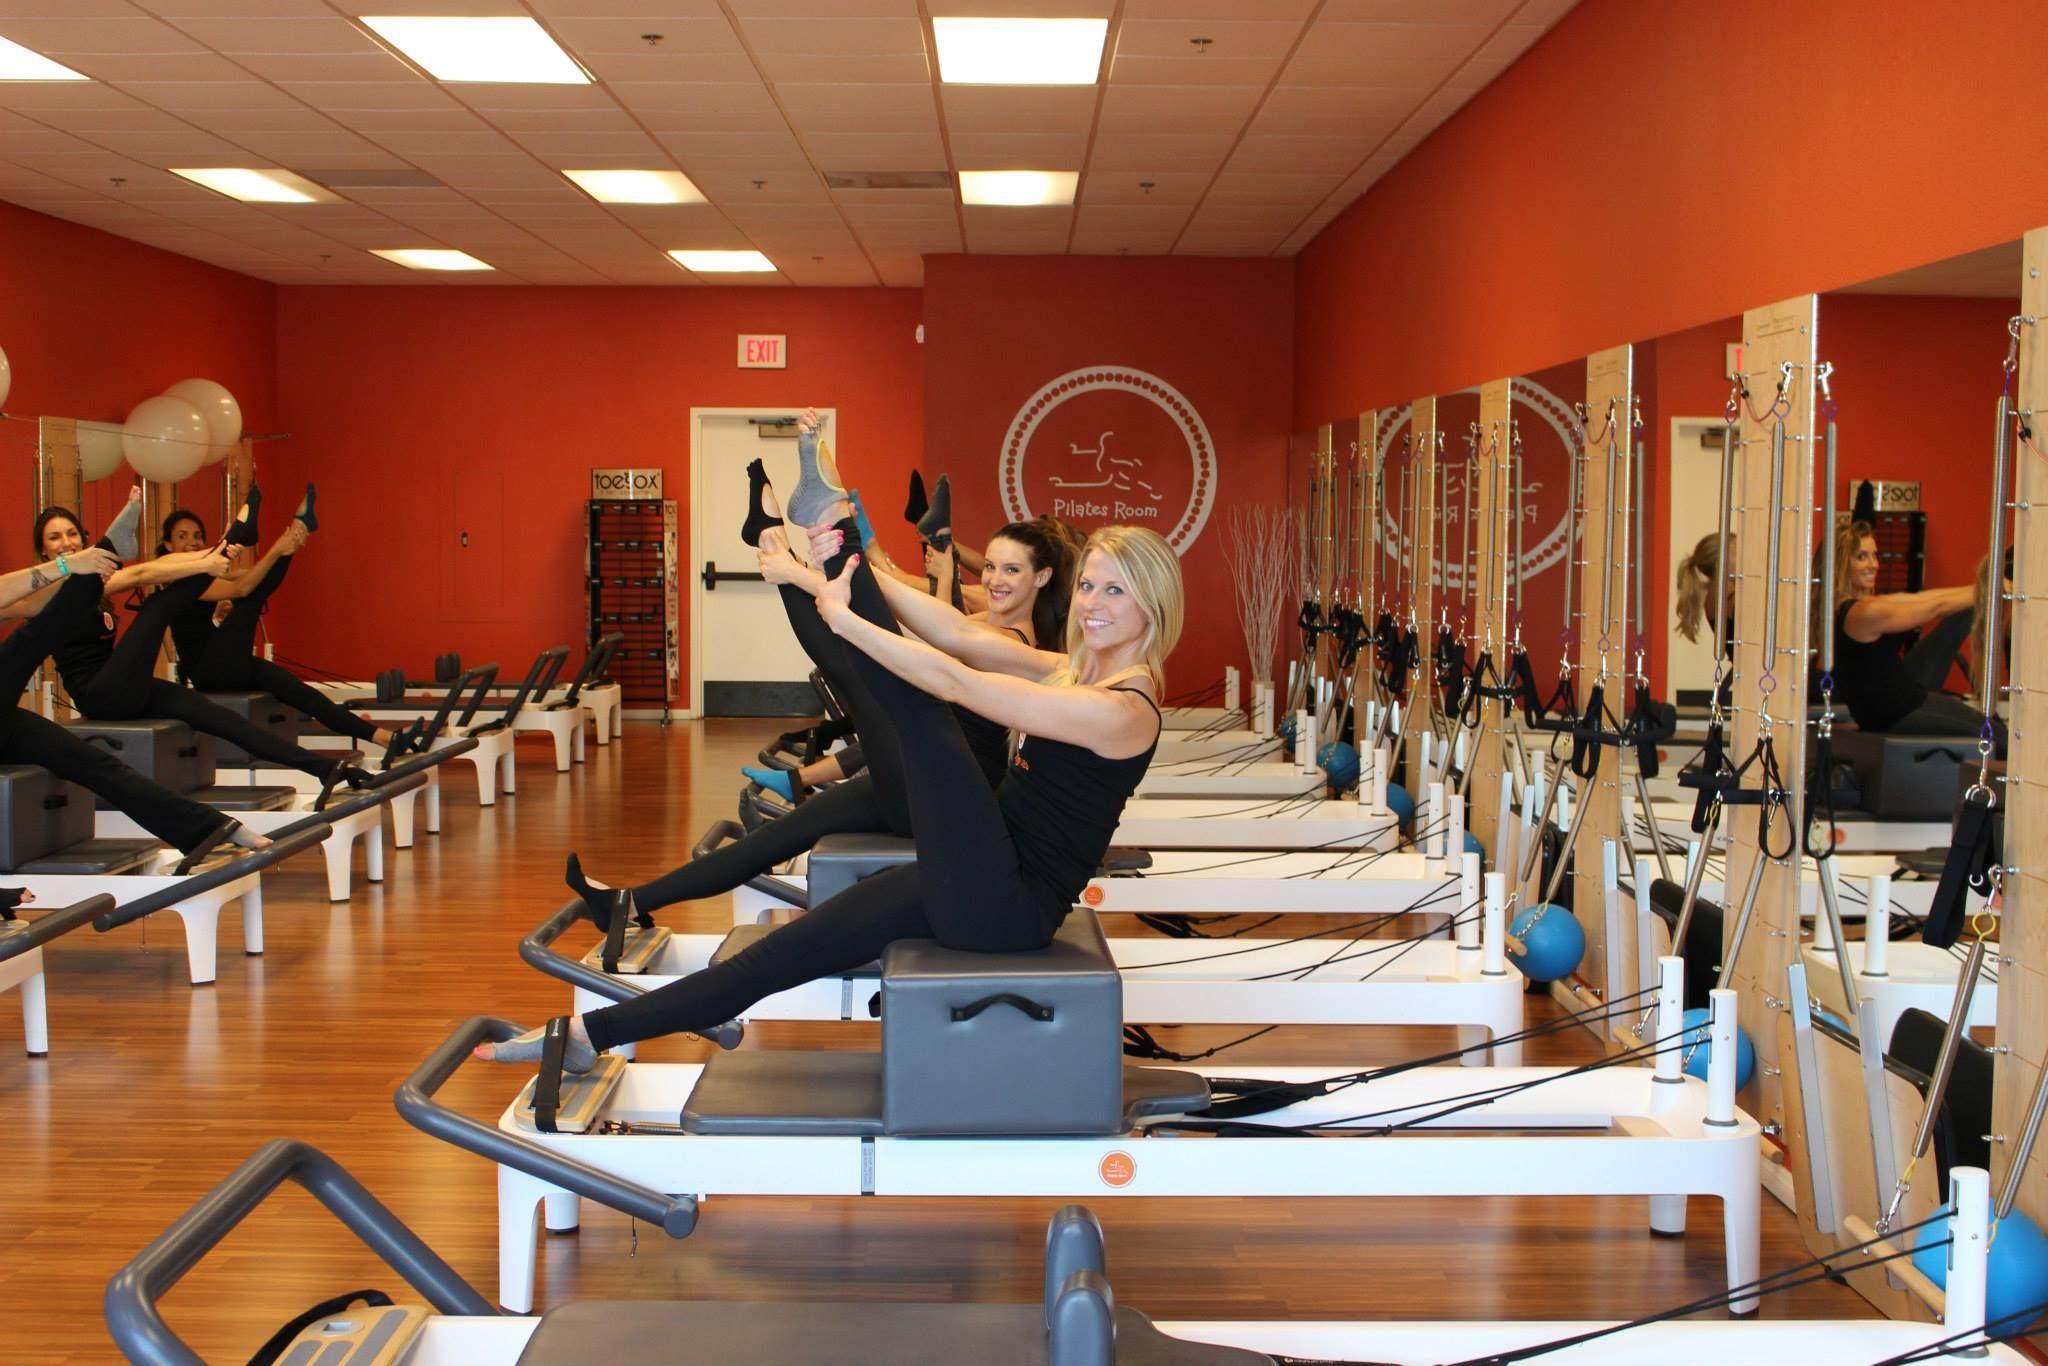 Pilates Room Studios Mission Valley Bethechange Studio